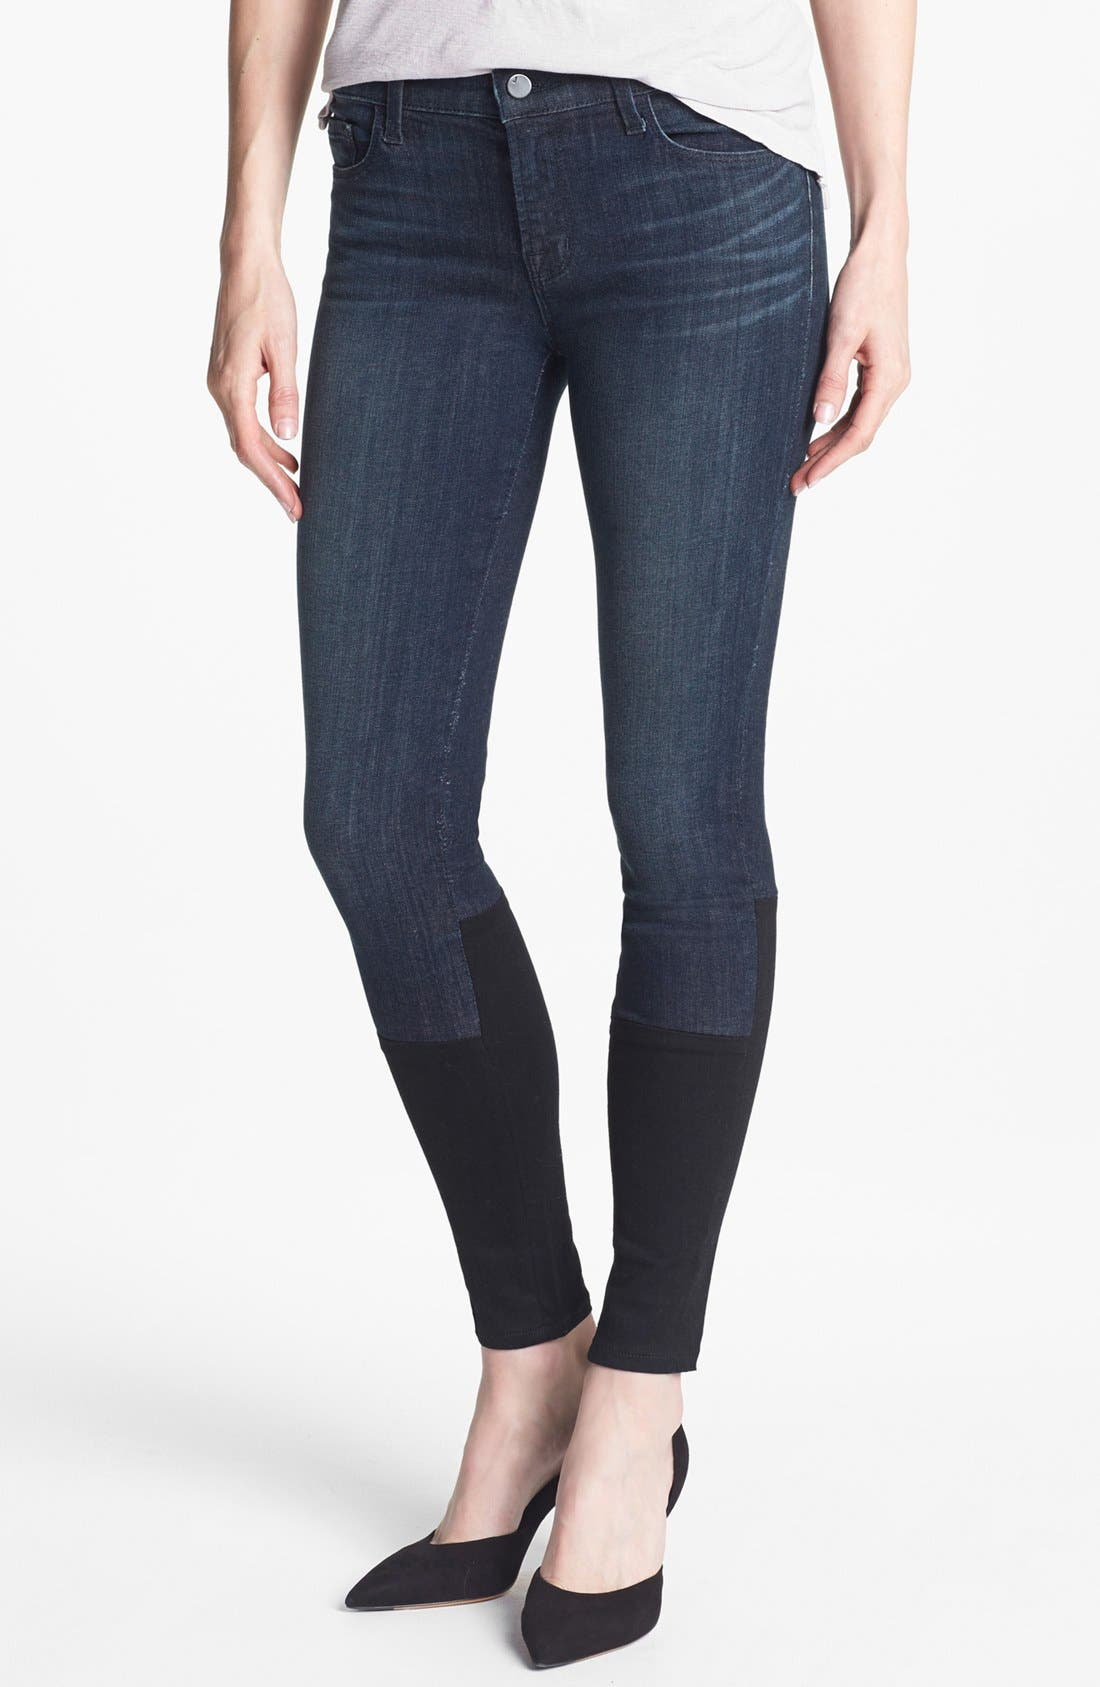 Alternate Image 1 Selected - J Brand '8066' Mid Rise Step Hem Skinny Jeans (Snowbird)